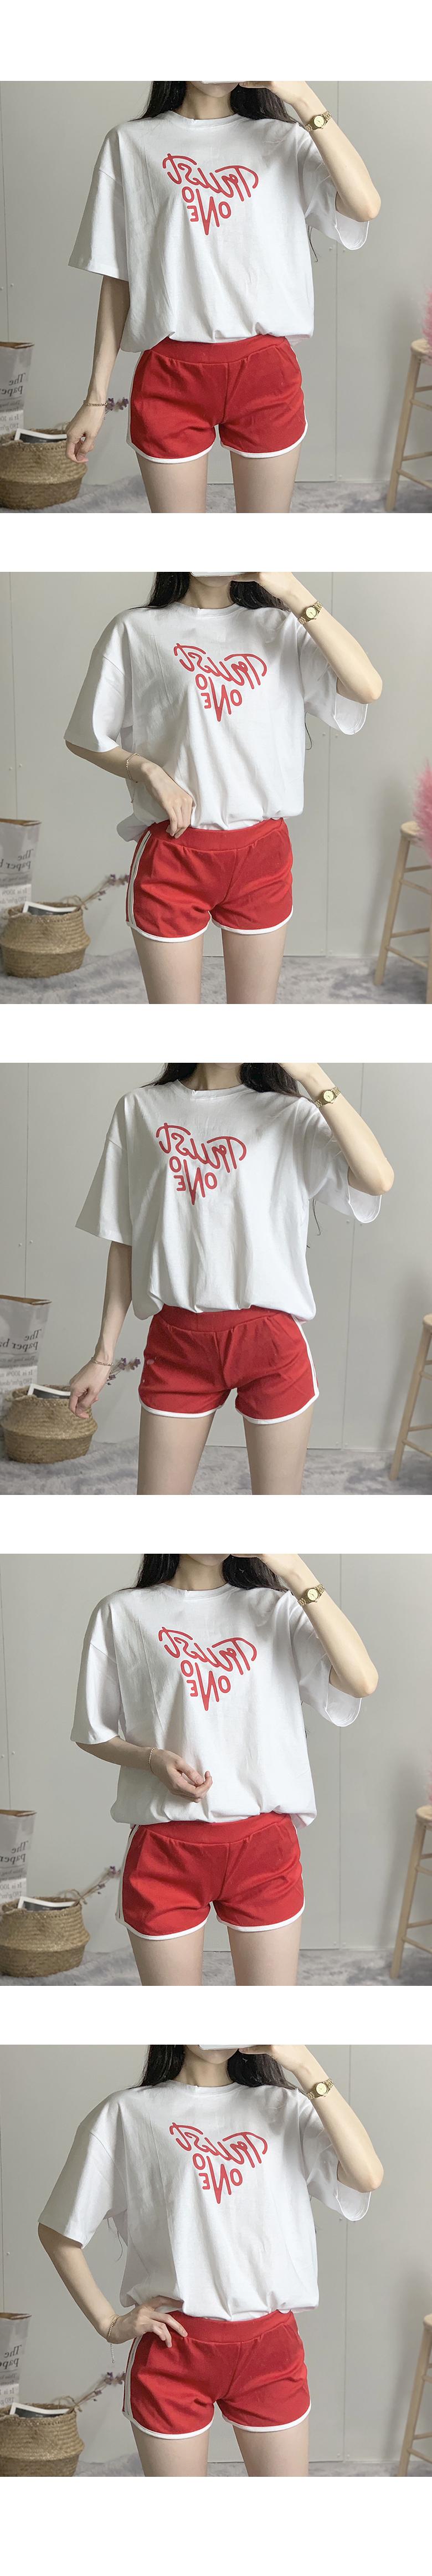 Heart Rouge Round Short Sleeve T-Shirt